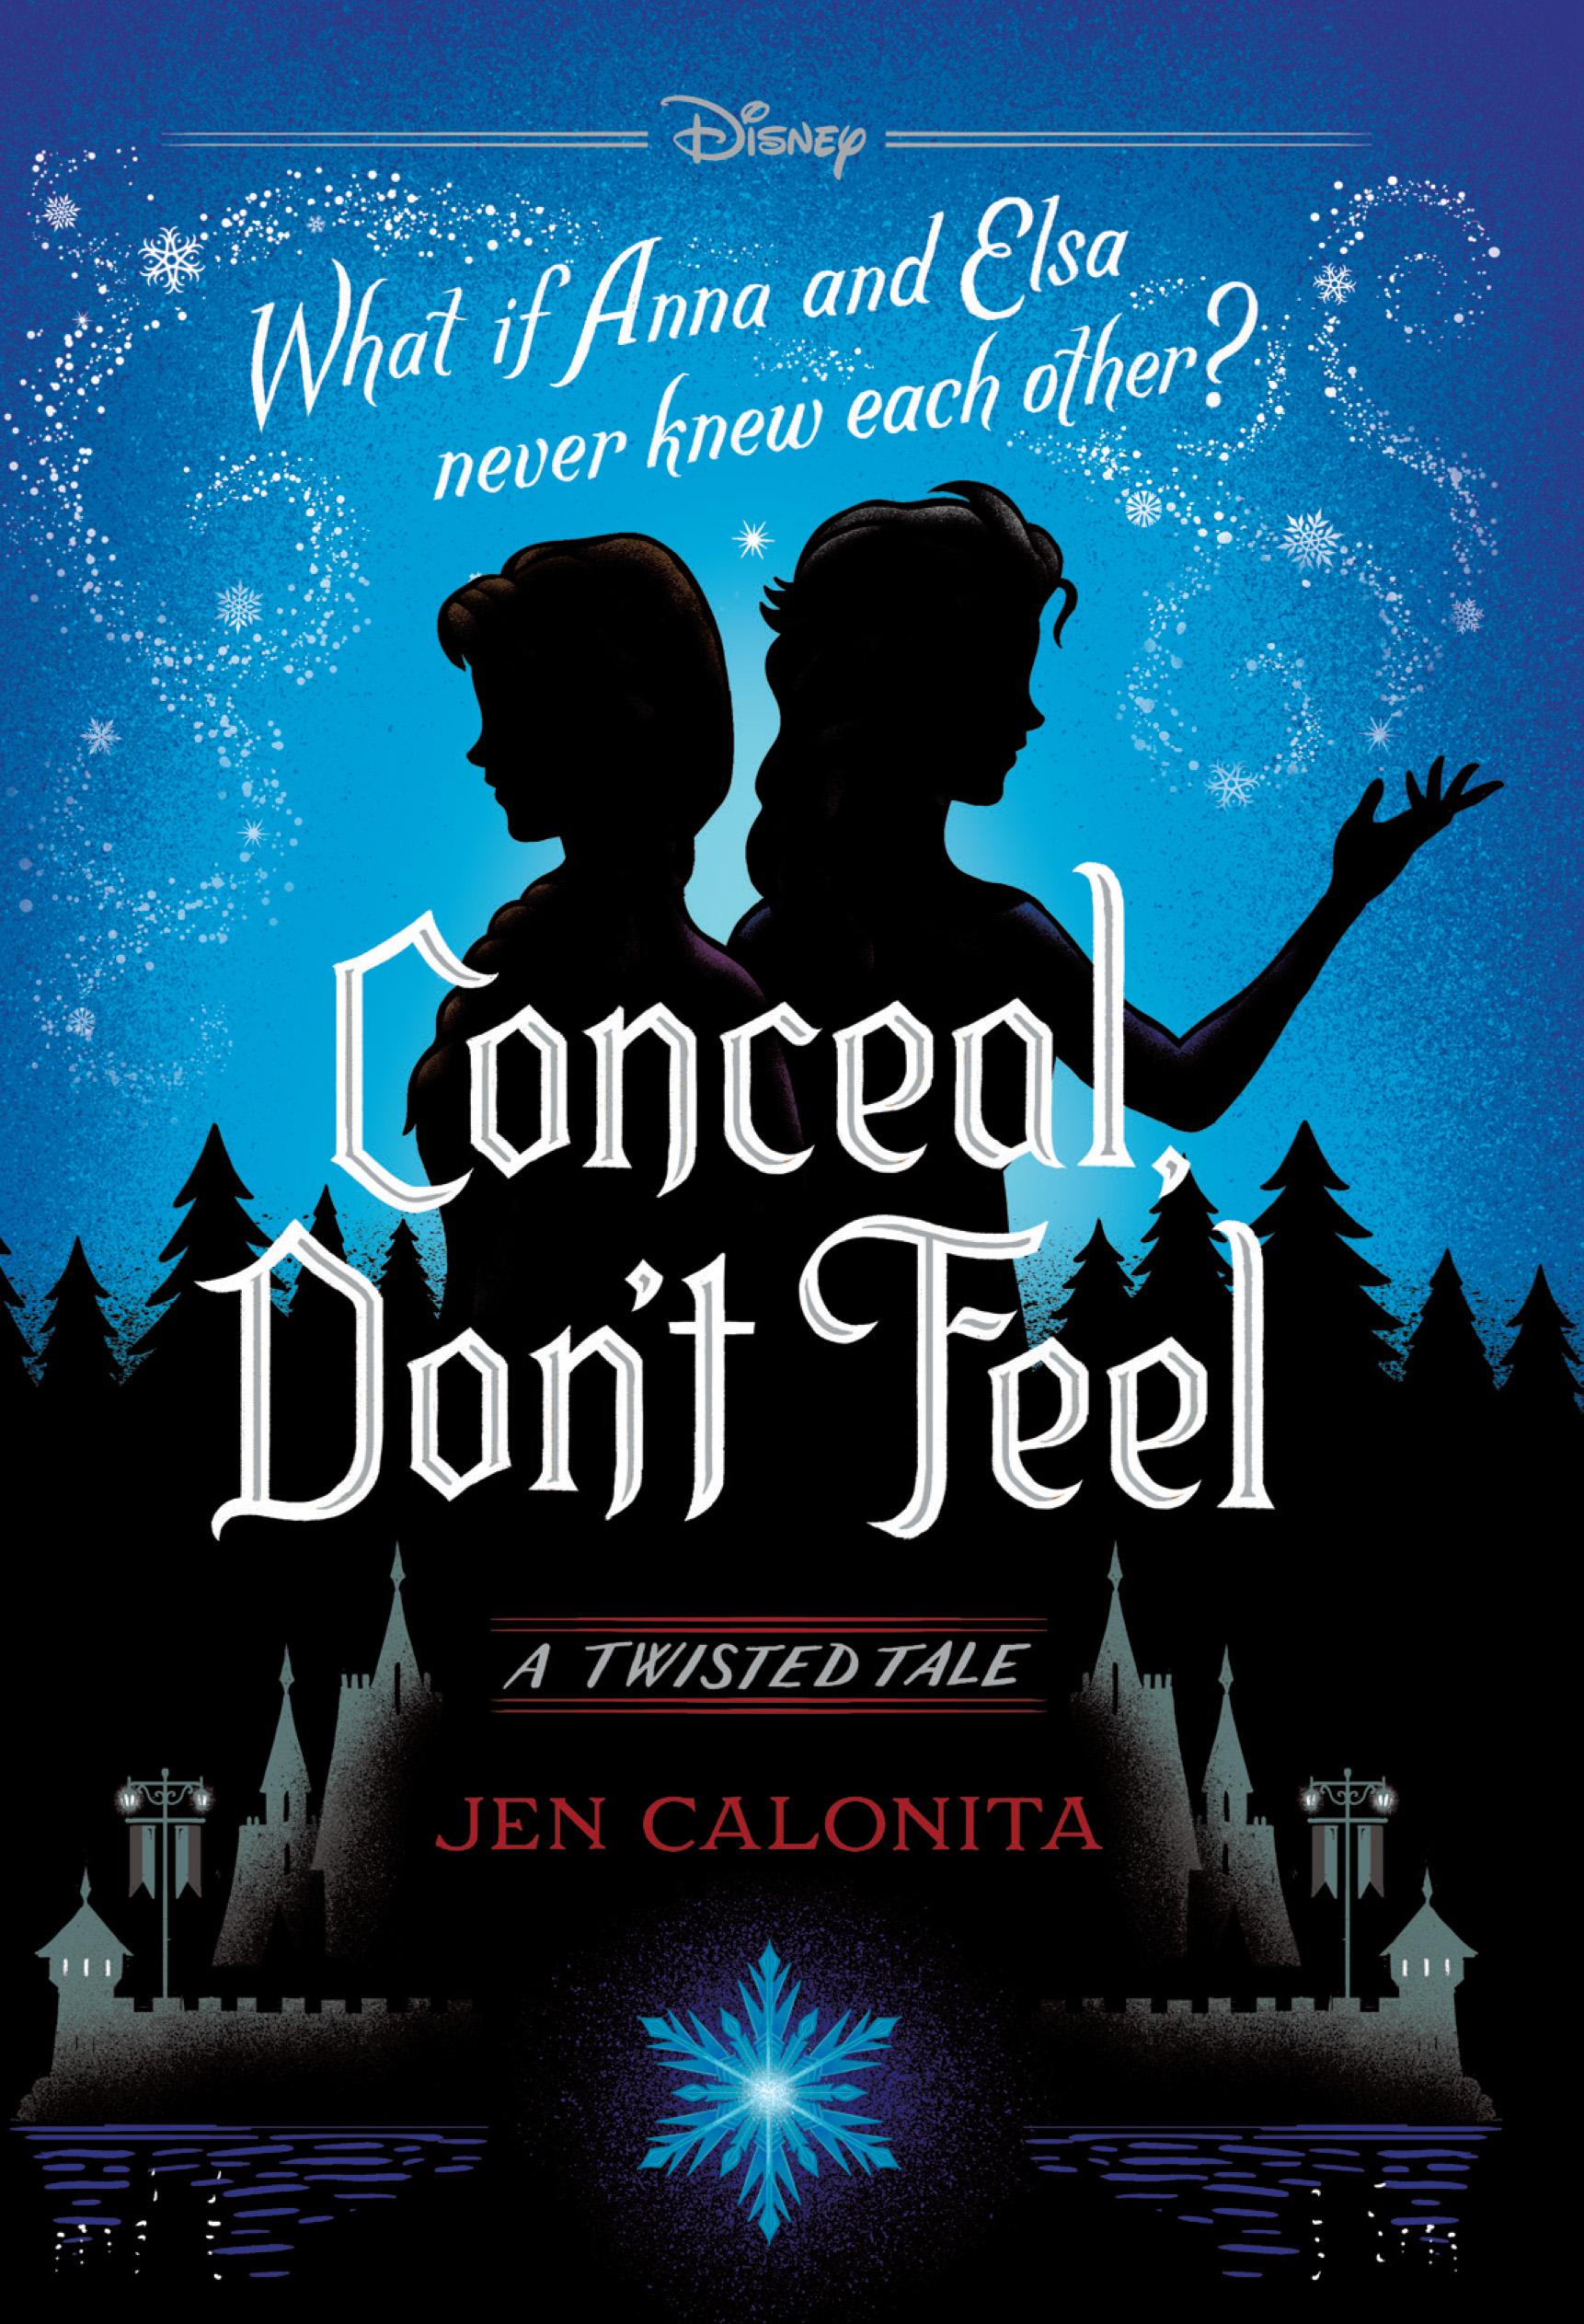 Free Twisted Tale Frozen Conceal Don't Feel Book by Jen Calonita